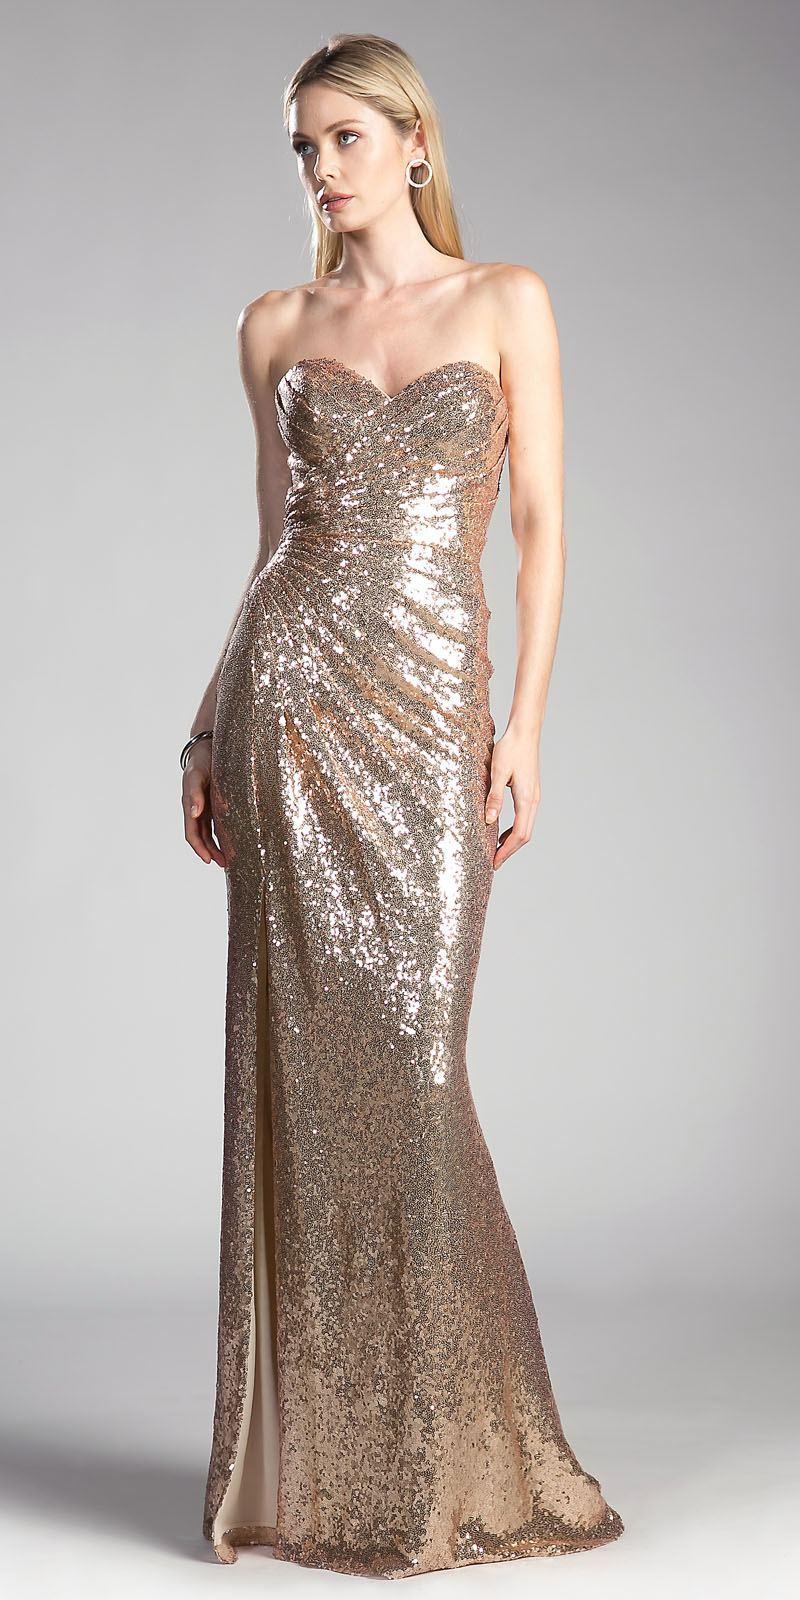 Cinderella Divine Ch561 Sequins Strapless Long Prom Dress